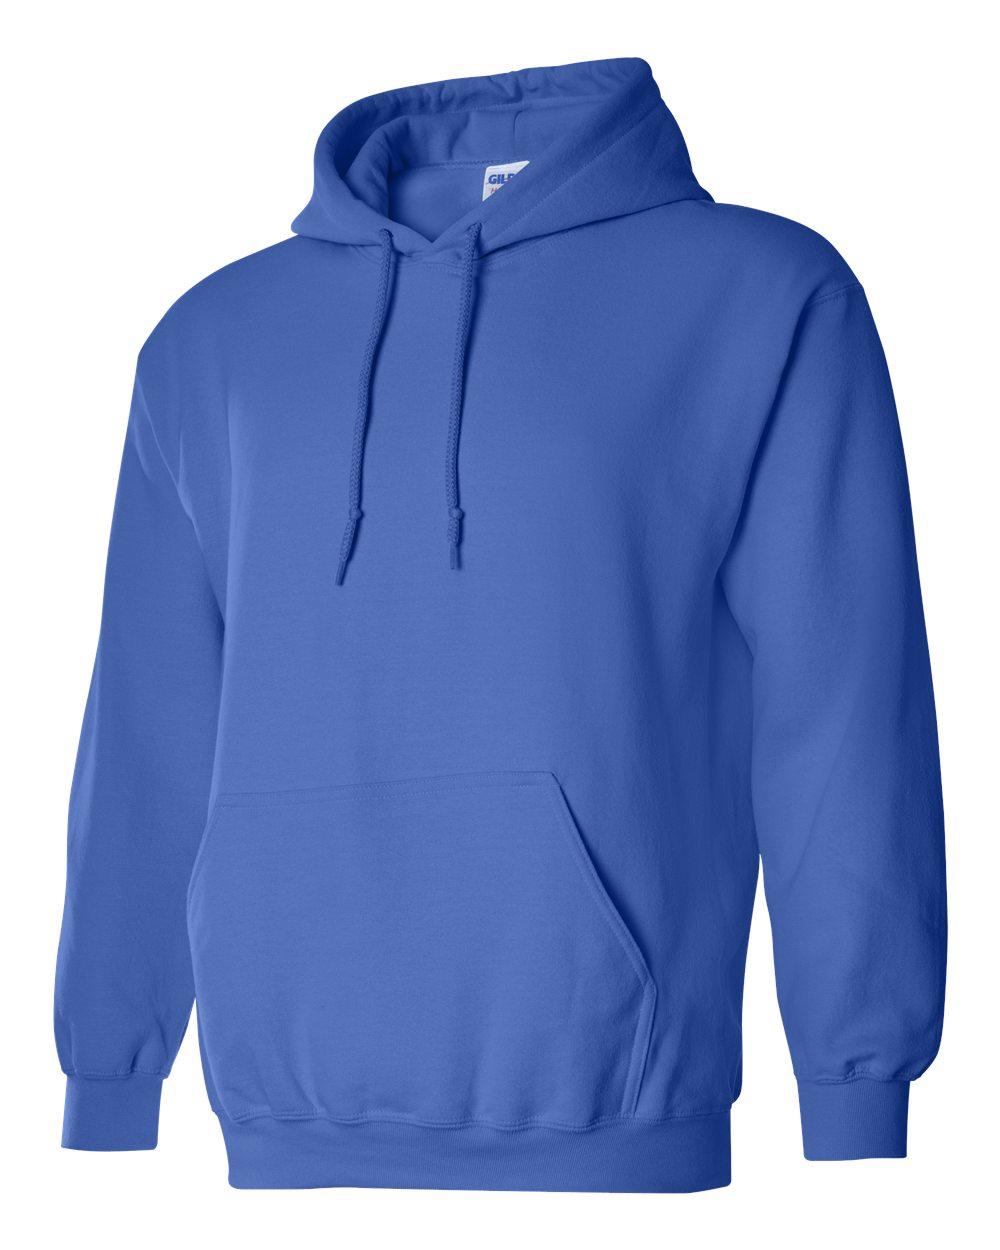 Gildan Heavy Blend Hooded Sweatshirt GI18500 Royal Blue